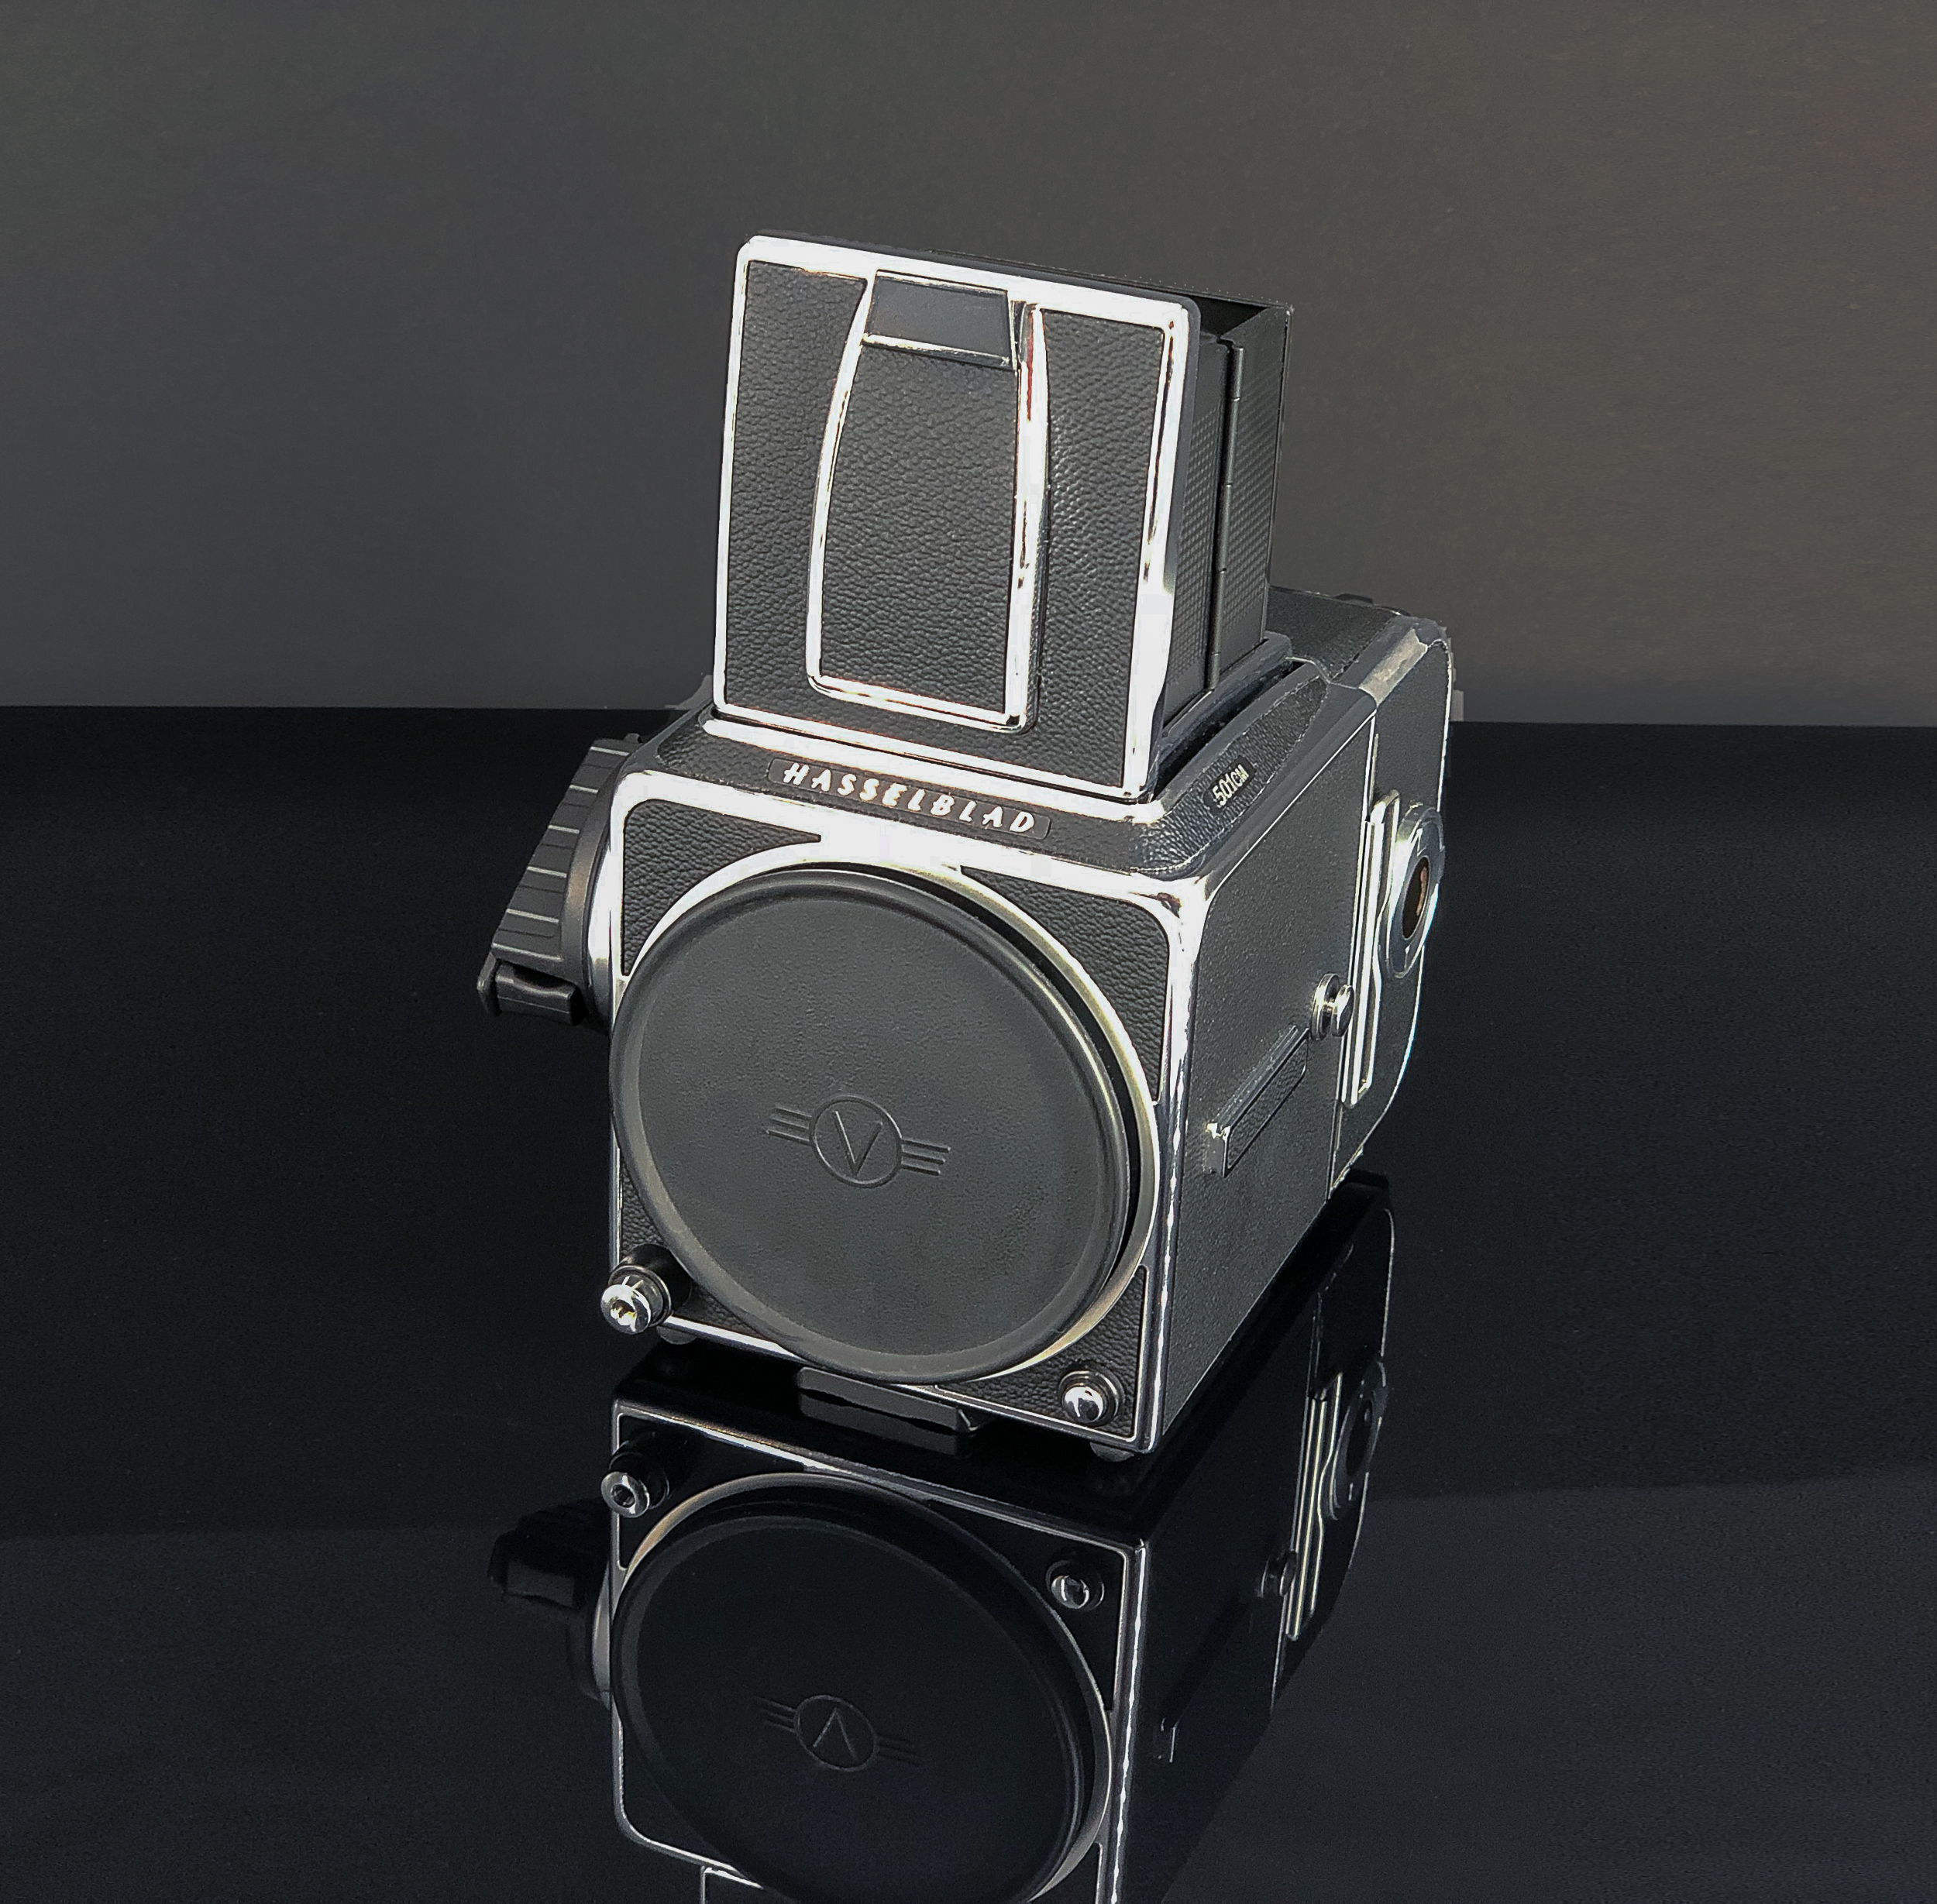 Hasselblad 501 CM